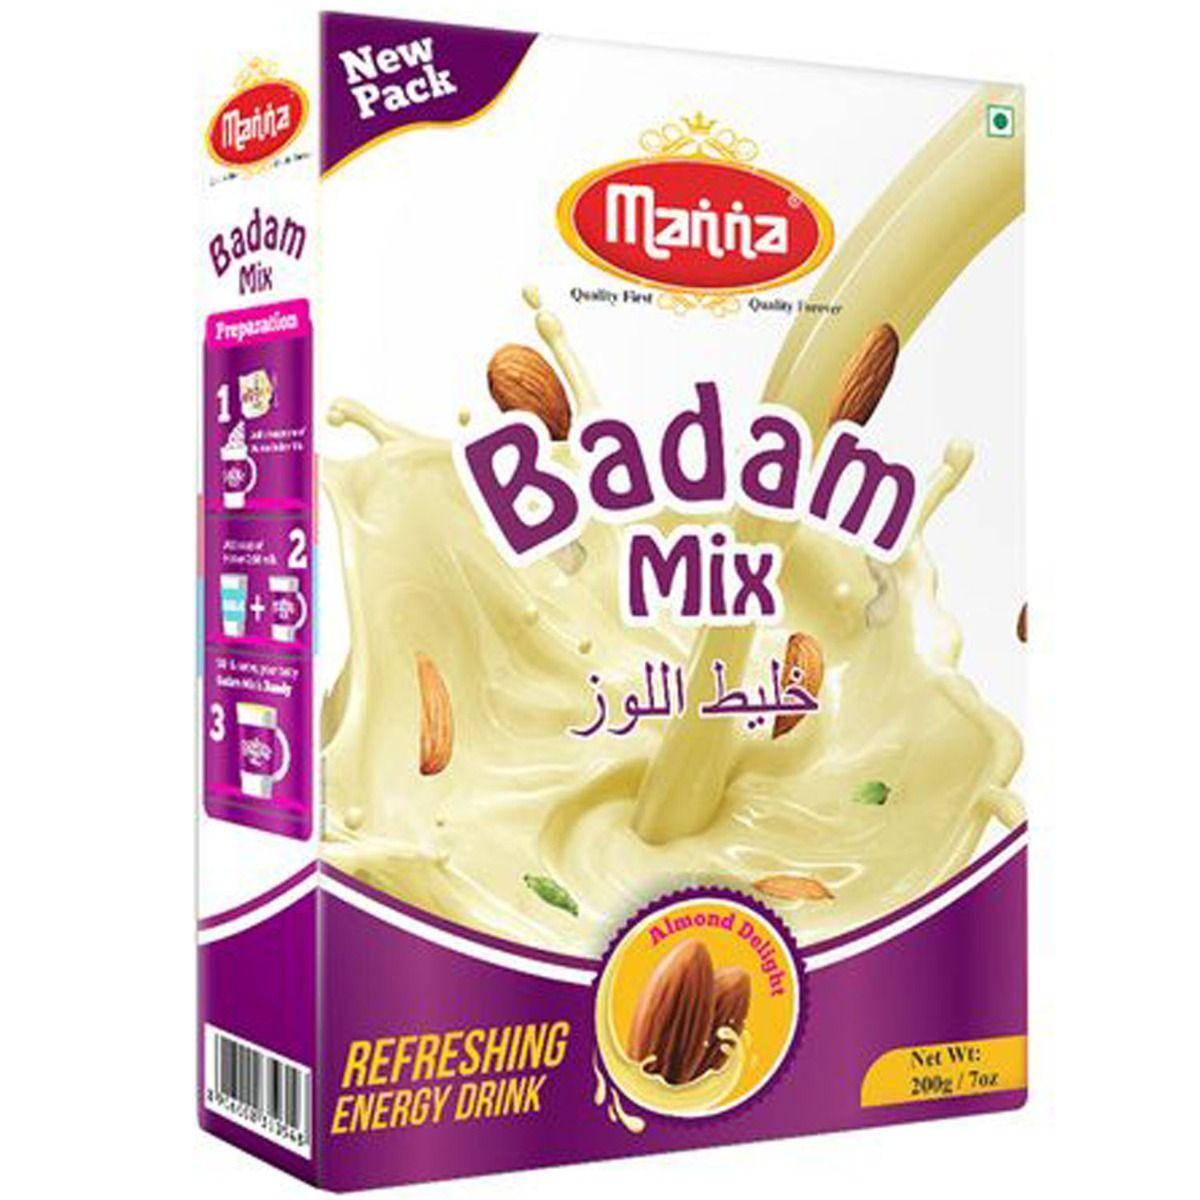 Manna Badam Mix Instant Refreshing Energy Drink, 200 gm